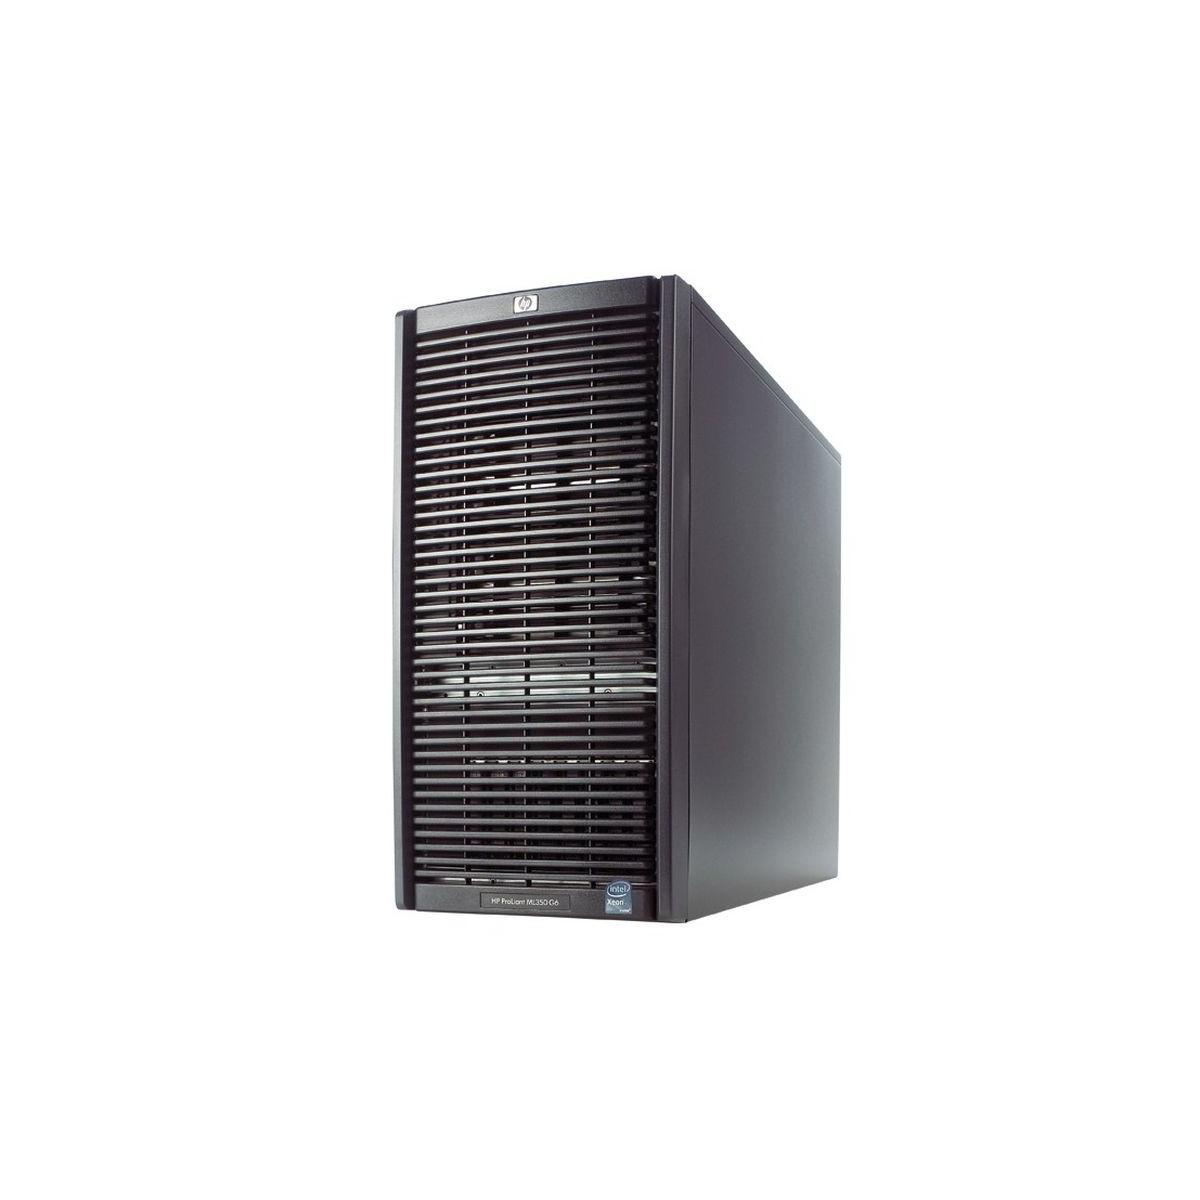 HP ML350 G6 2.4 QC 16GB 3x500GB 2xPSU P410i ILO2